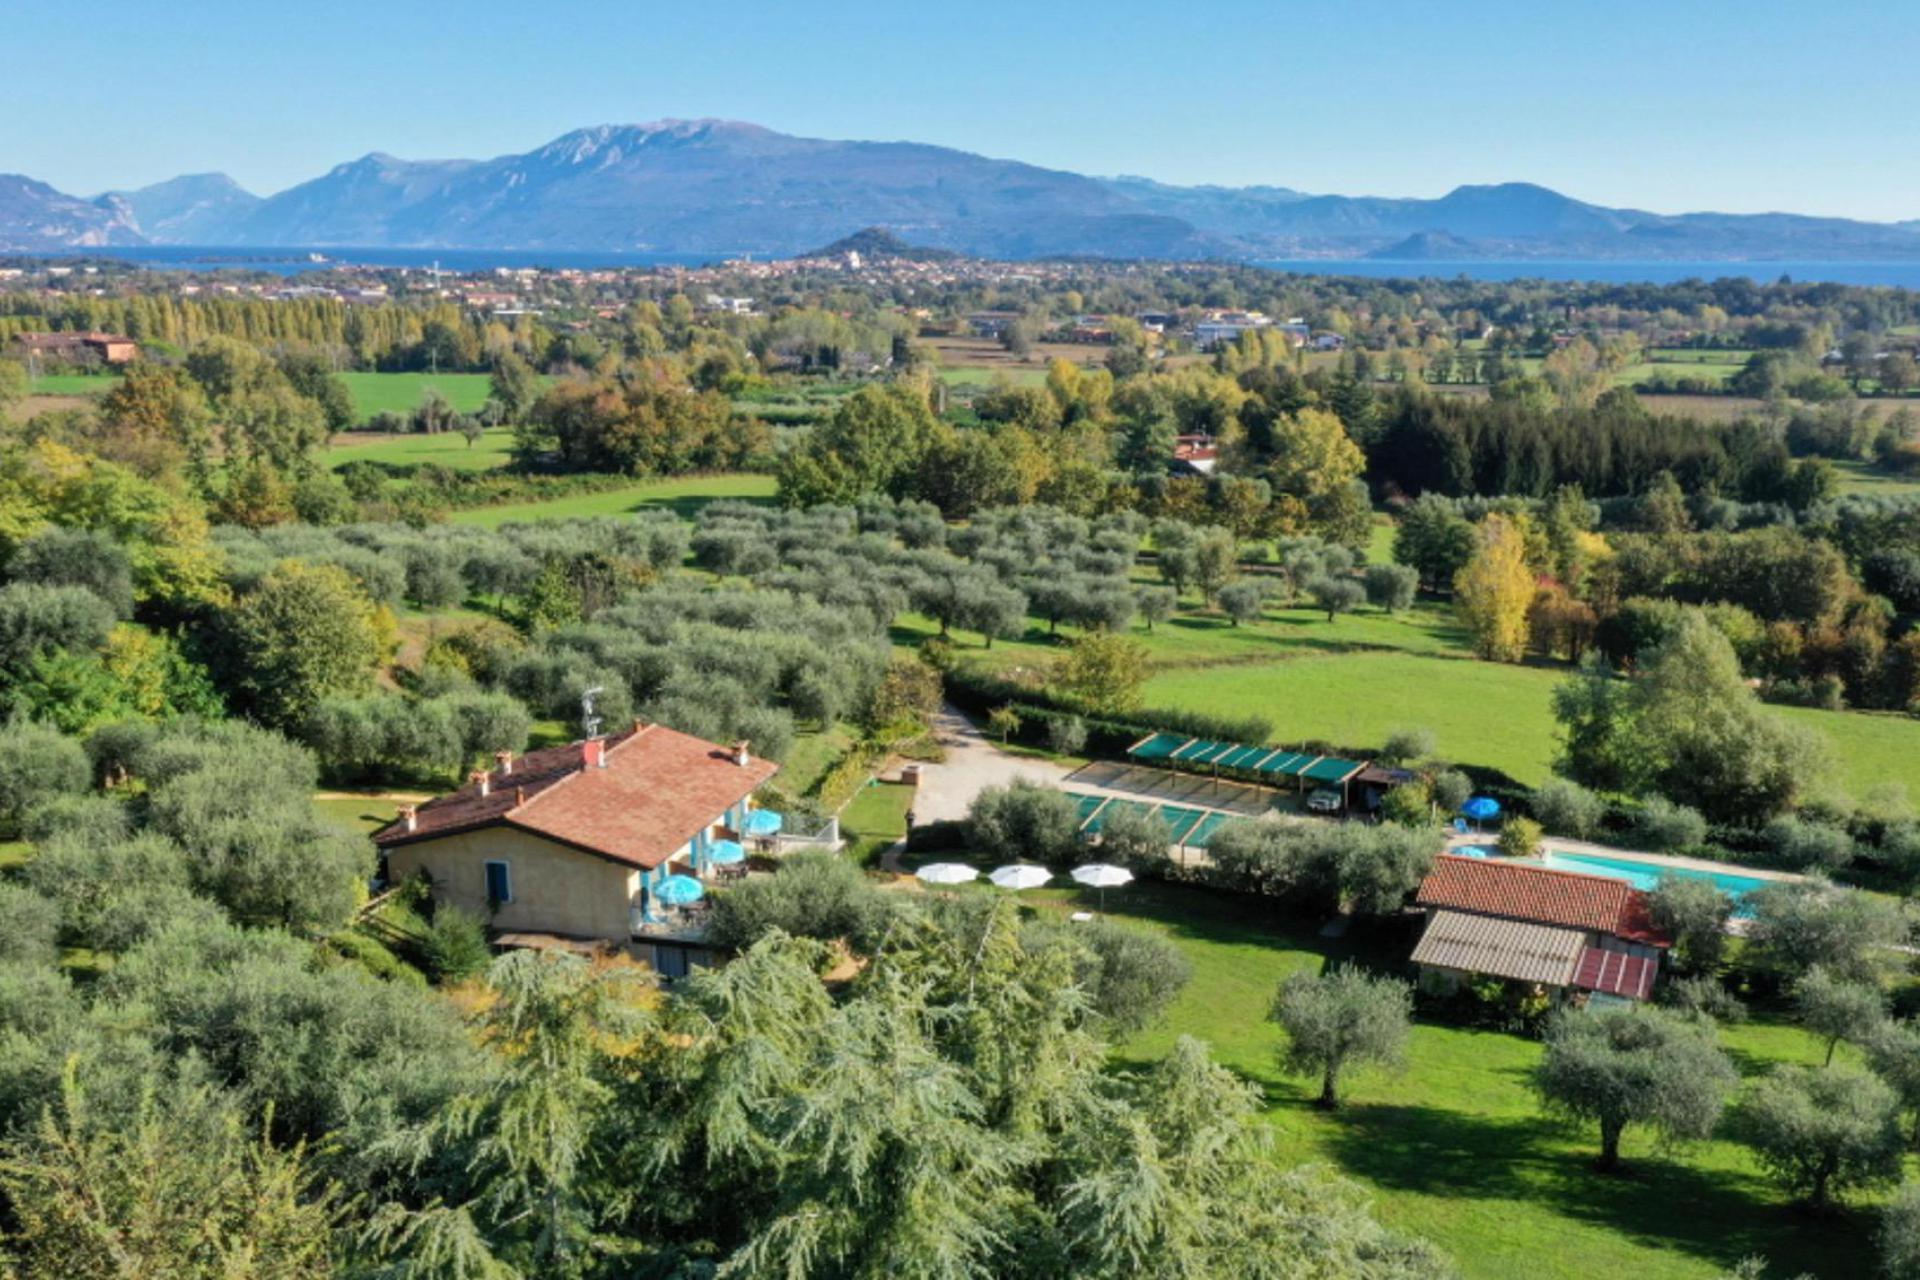 Agriturismo Lake Como and Lake Garda Small cozy agriturismo in an olive grove near Lake Garda